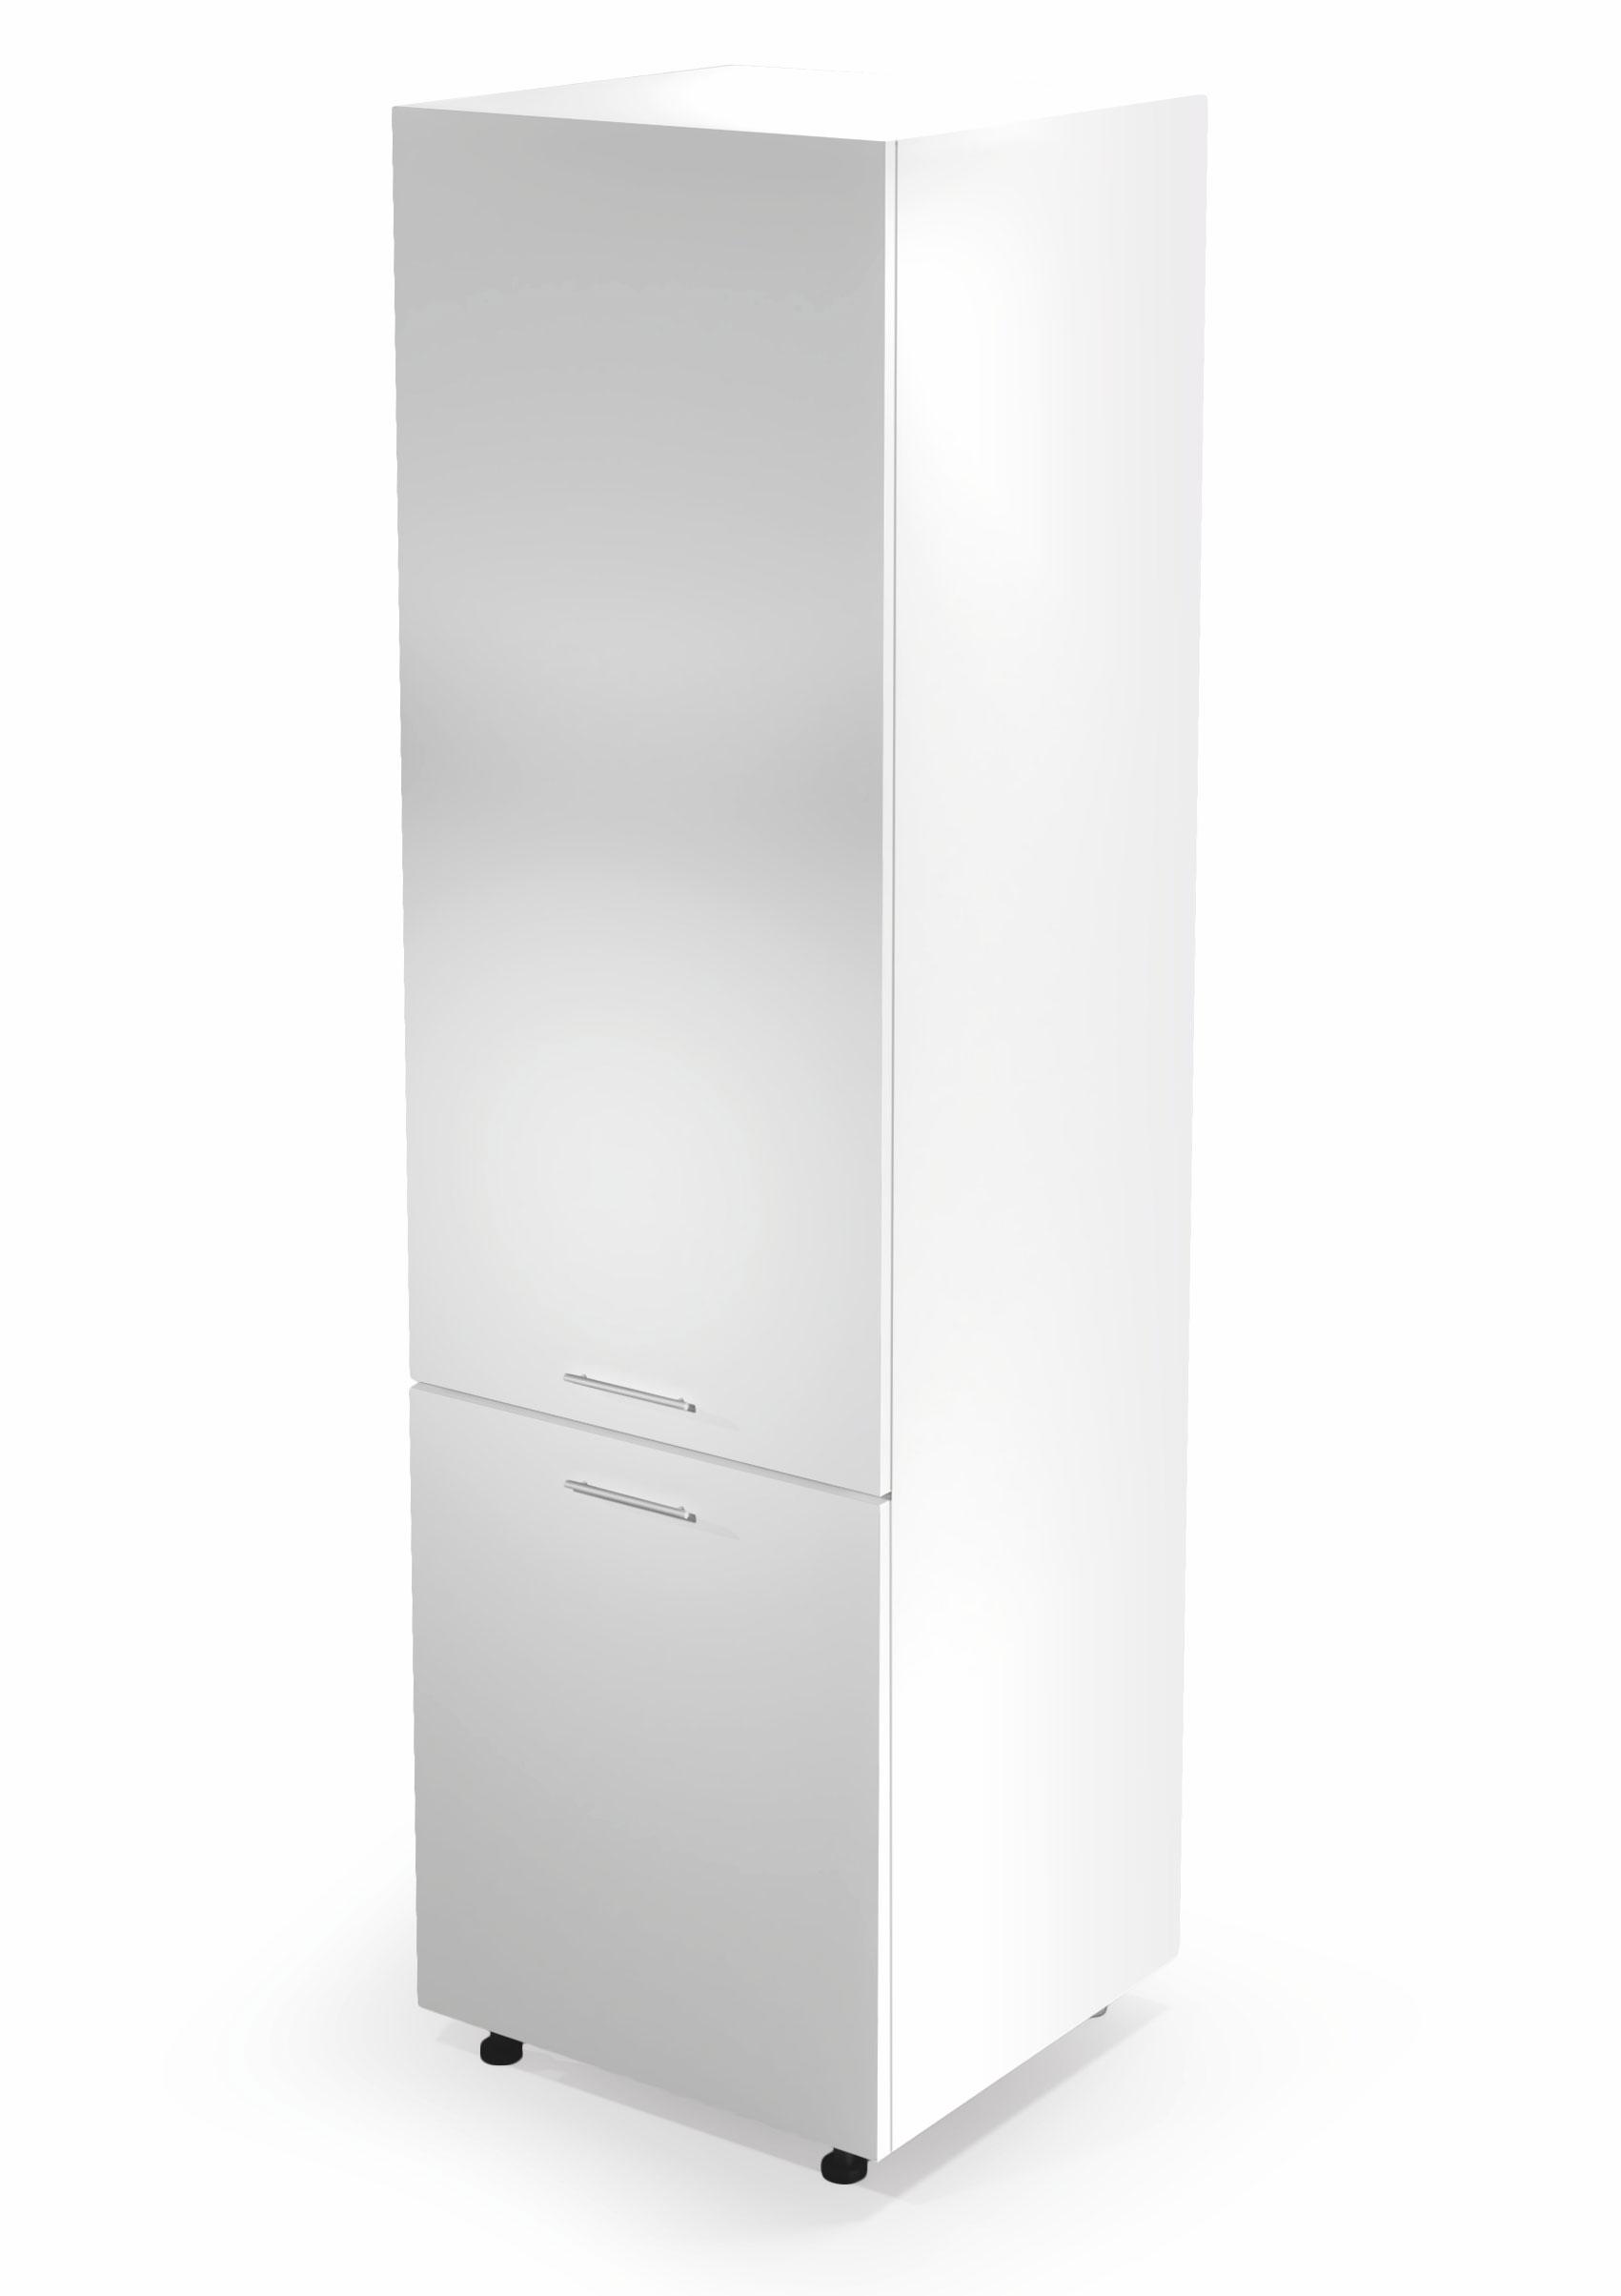 VENTO DL-60/214 szafka dolna wysoka front: biały (2p=1szt)